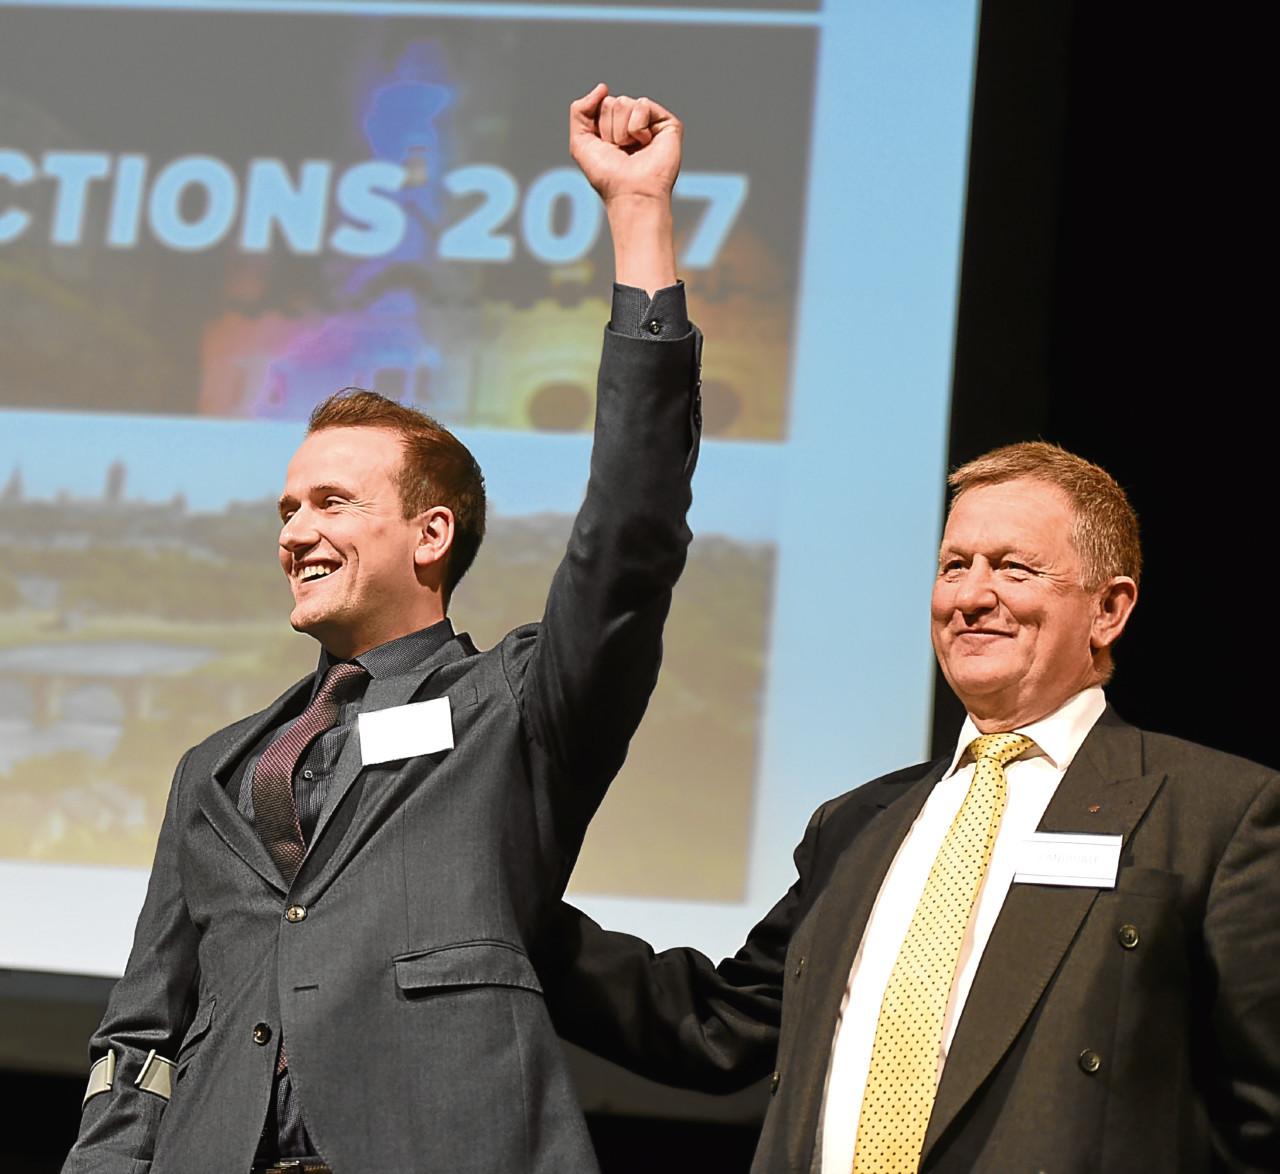 SNP councillors Stephen Flynn, left, and Alex Nicoll.